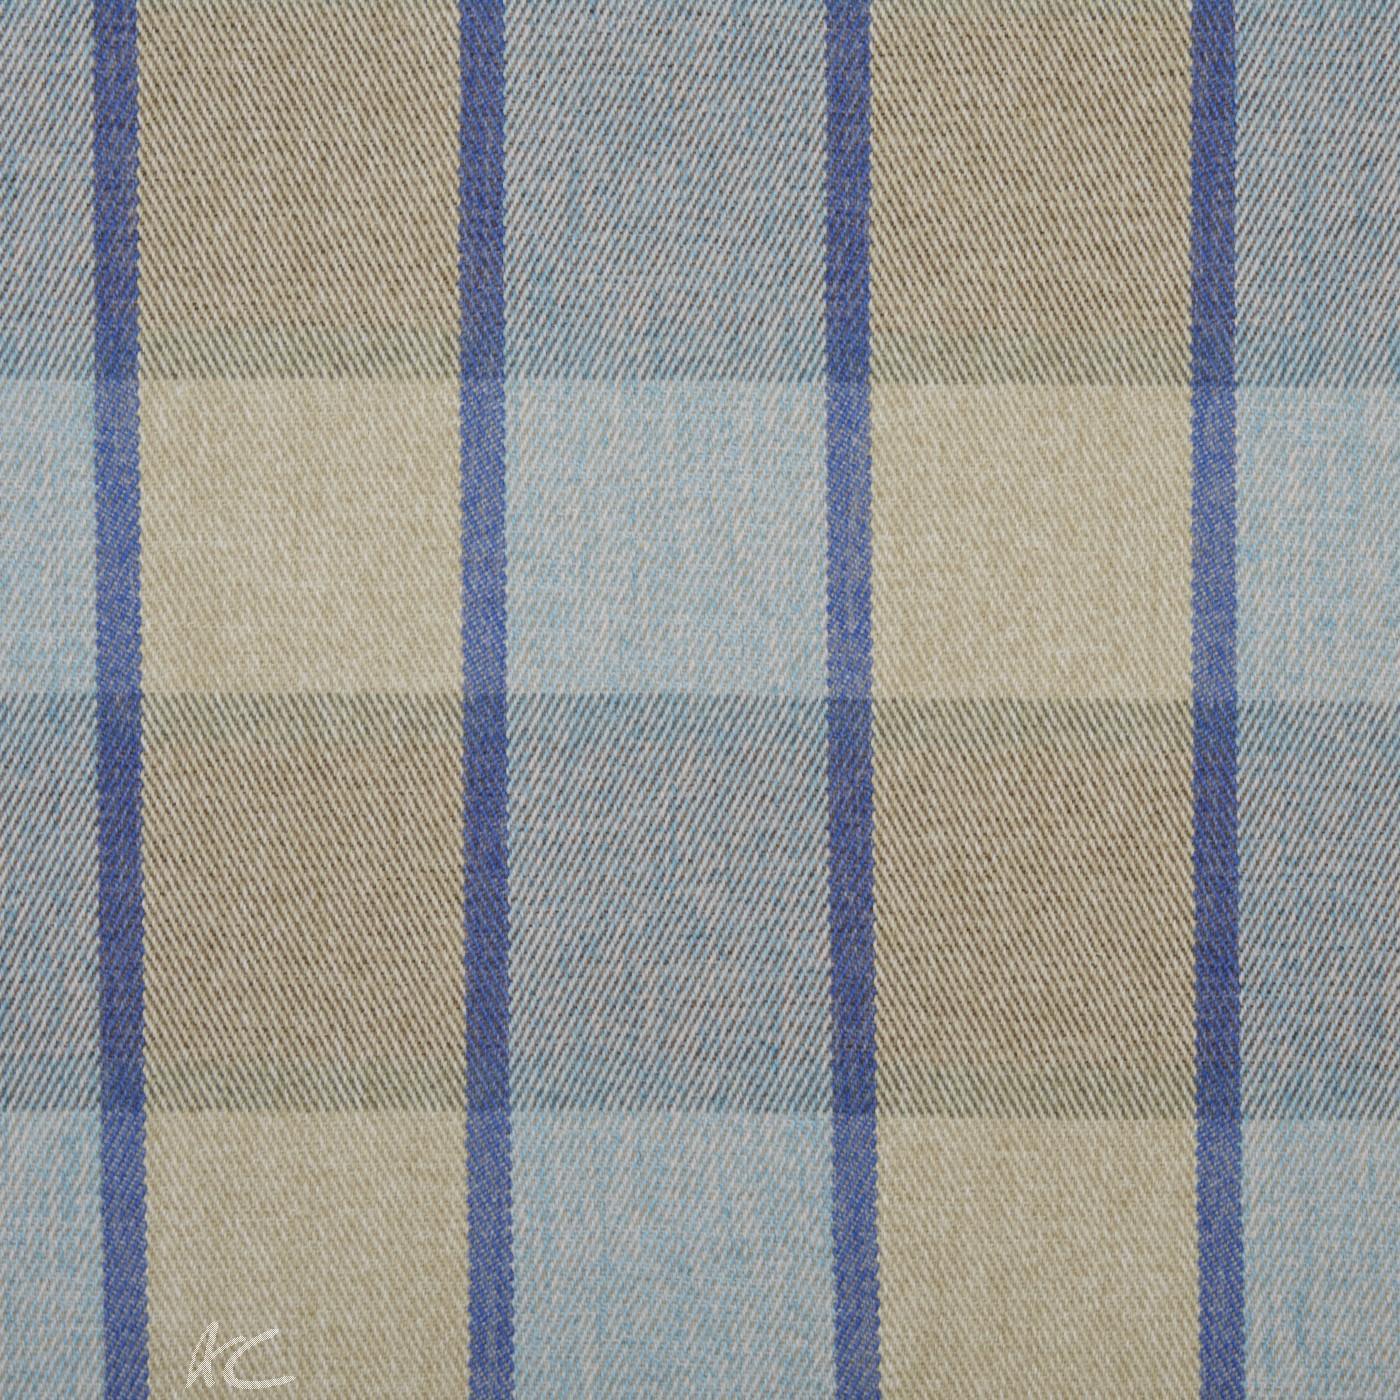 Prestigious Textiles Highlands Solway Loch Curtain Fabric